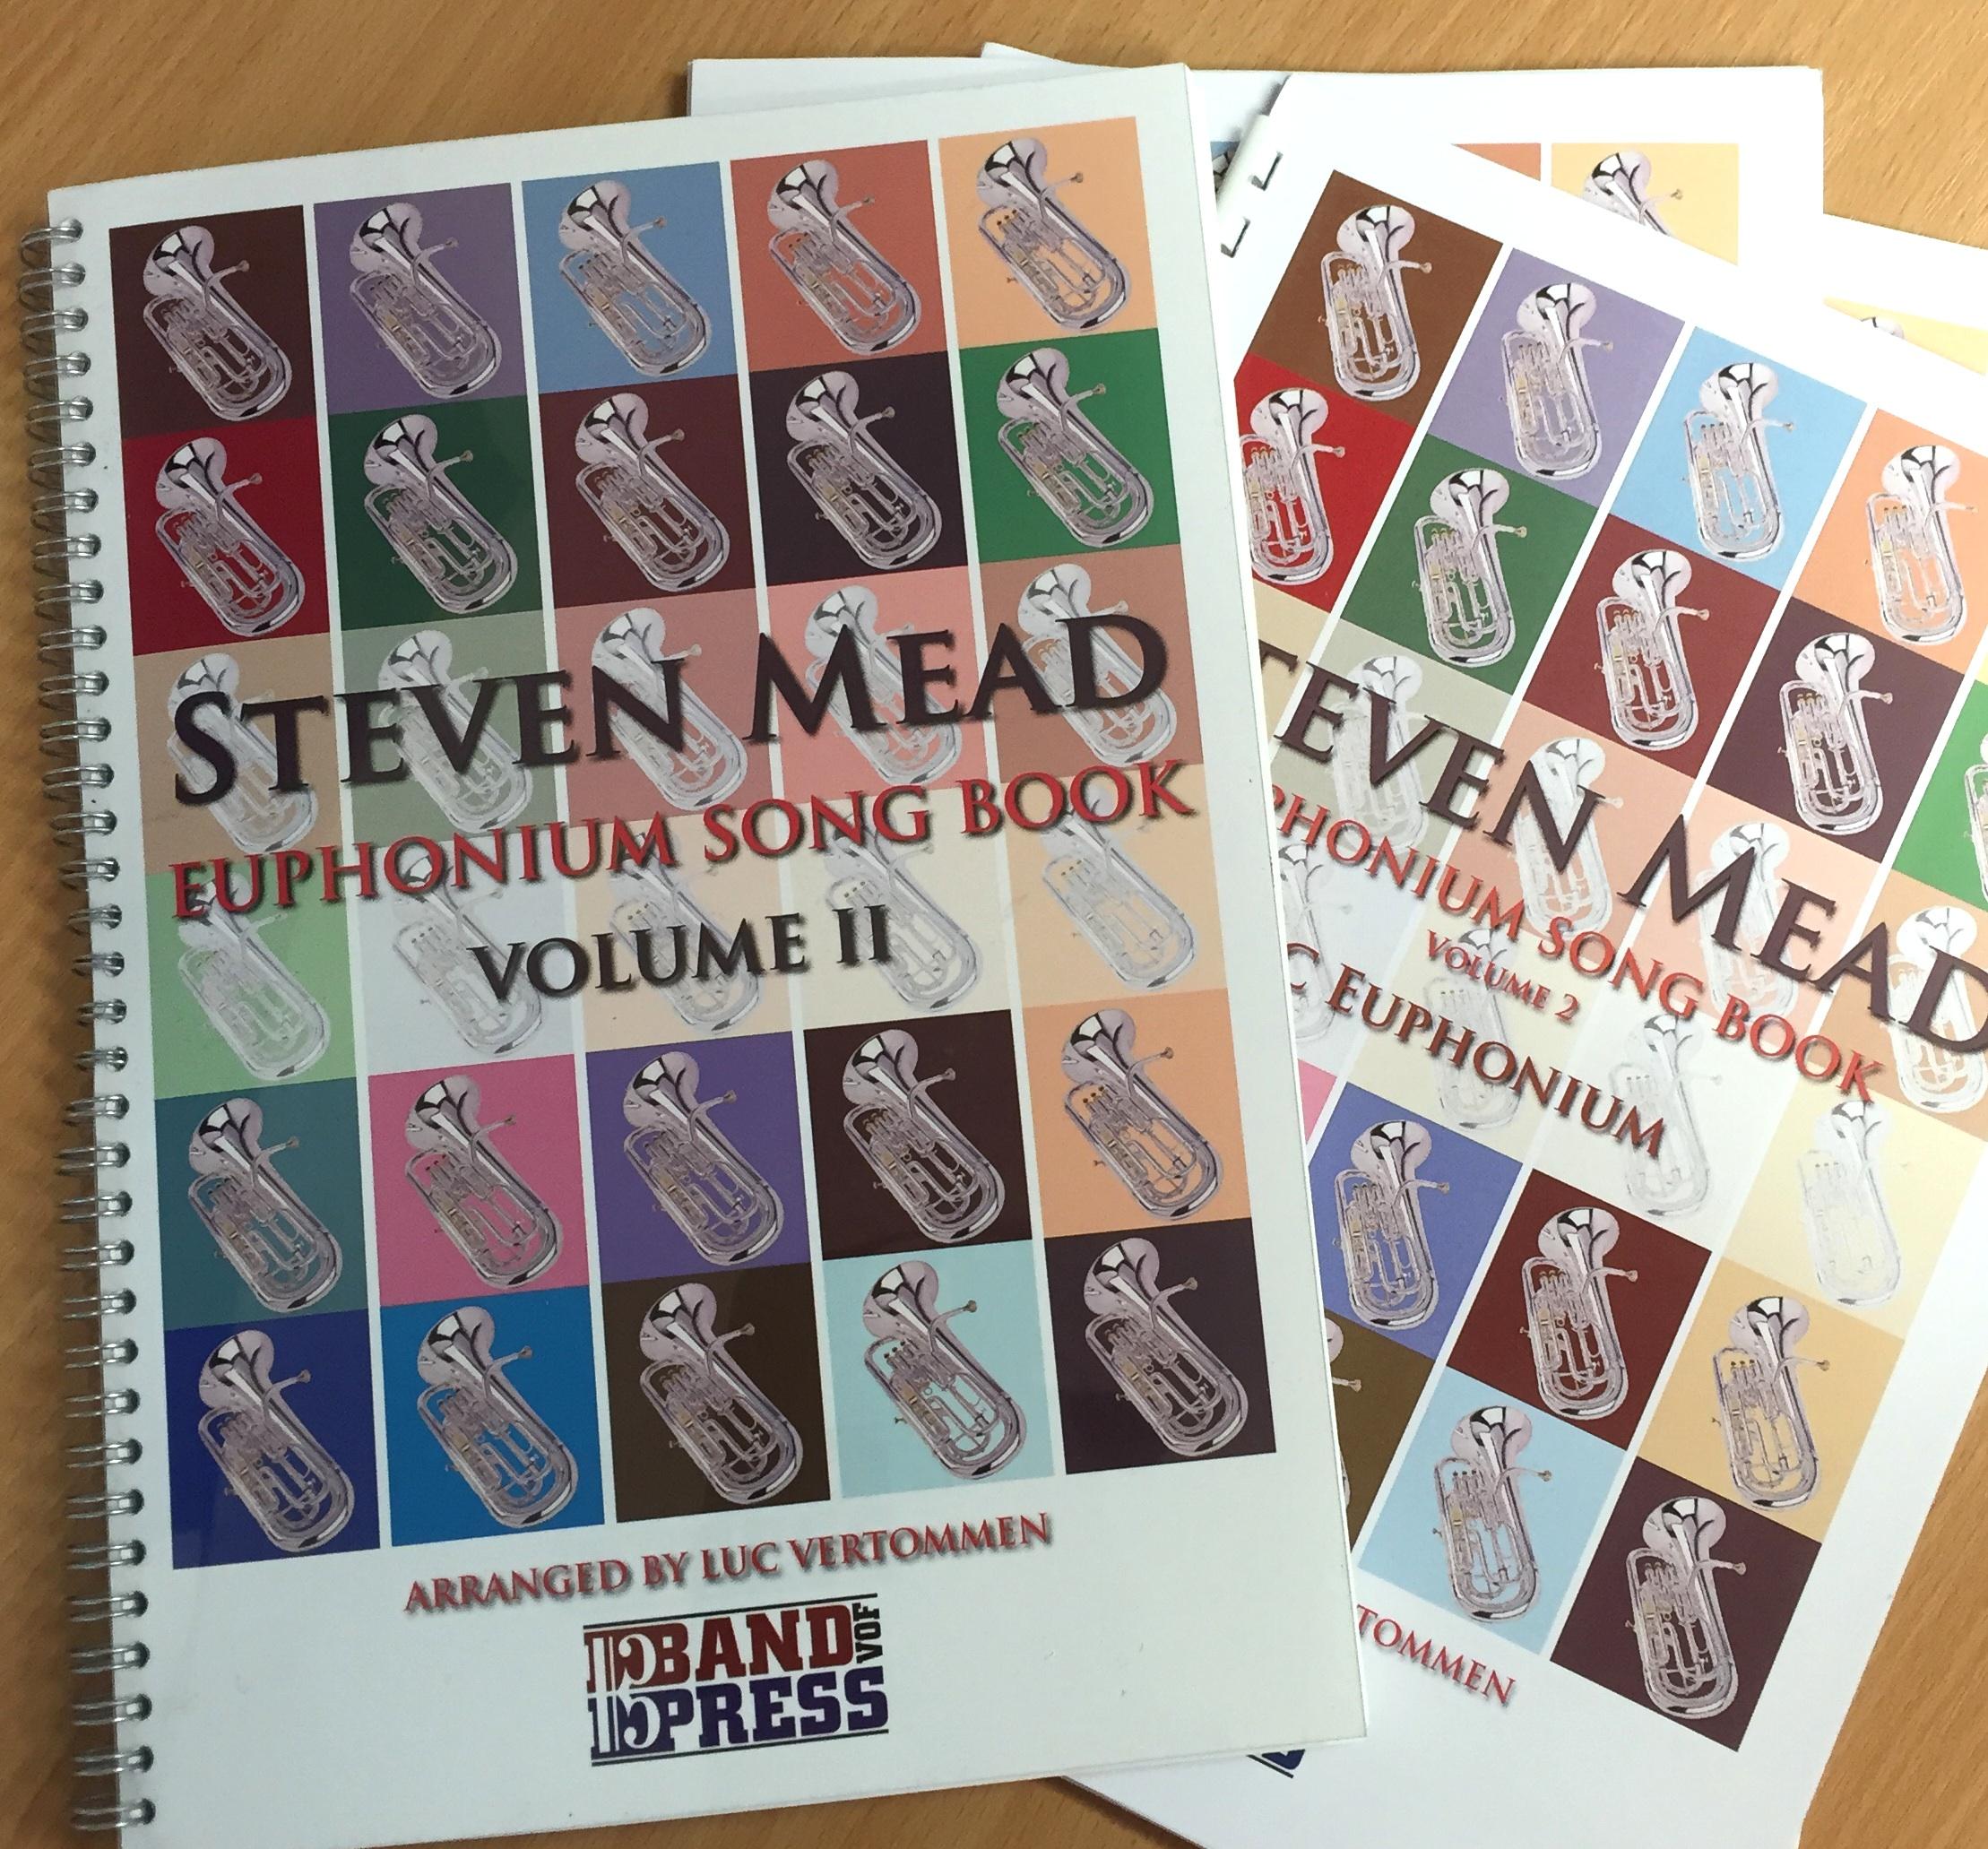 Steven Mead Euphonium Song Book Vol.2 - Arr.Luc Vertommen